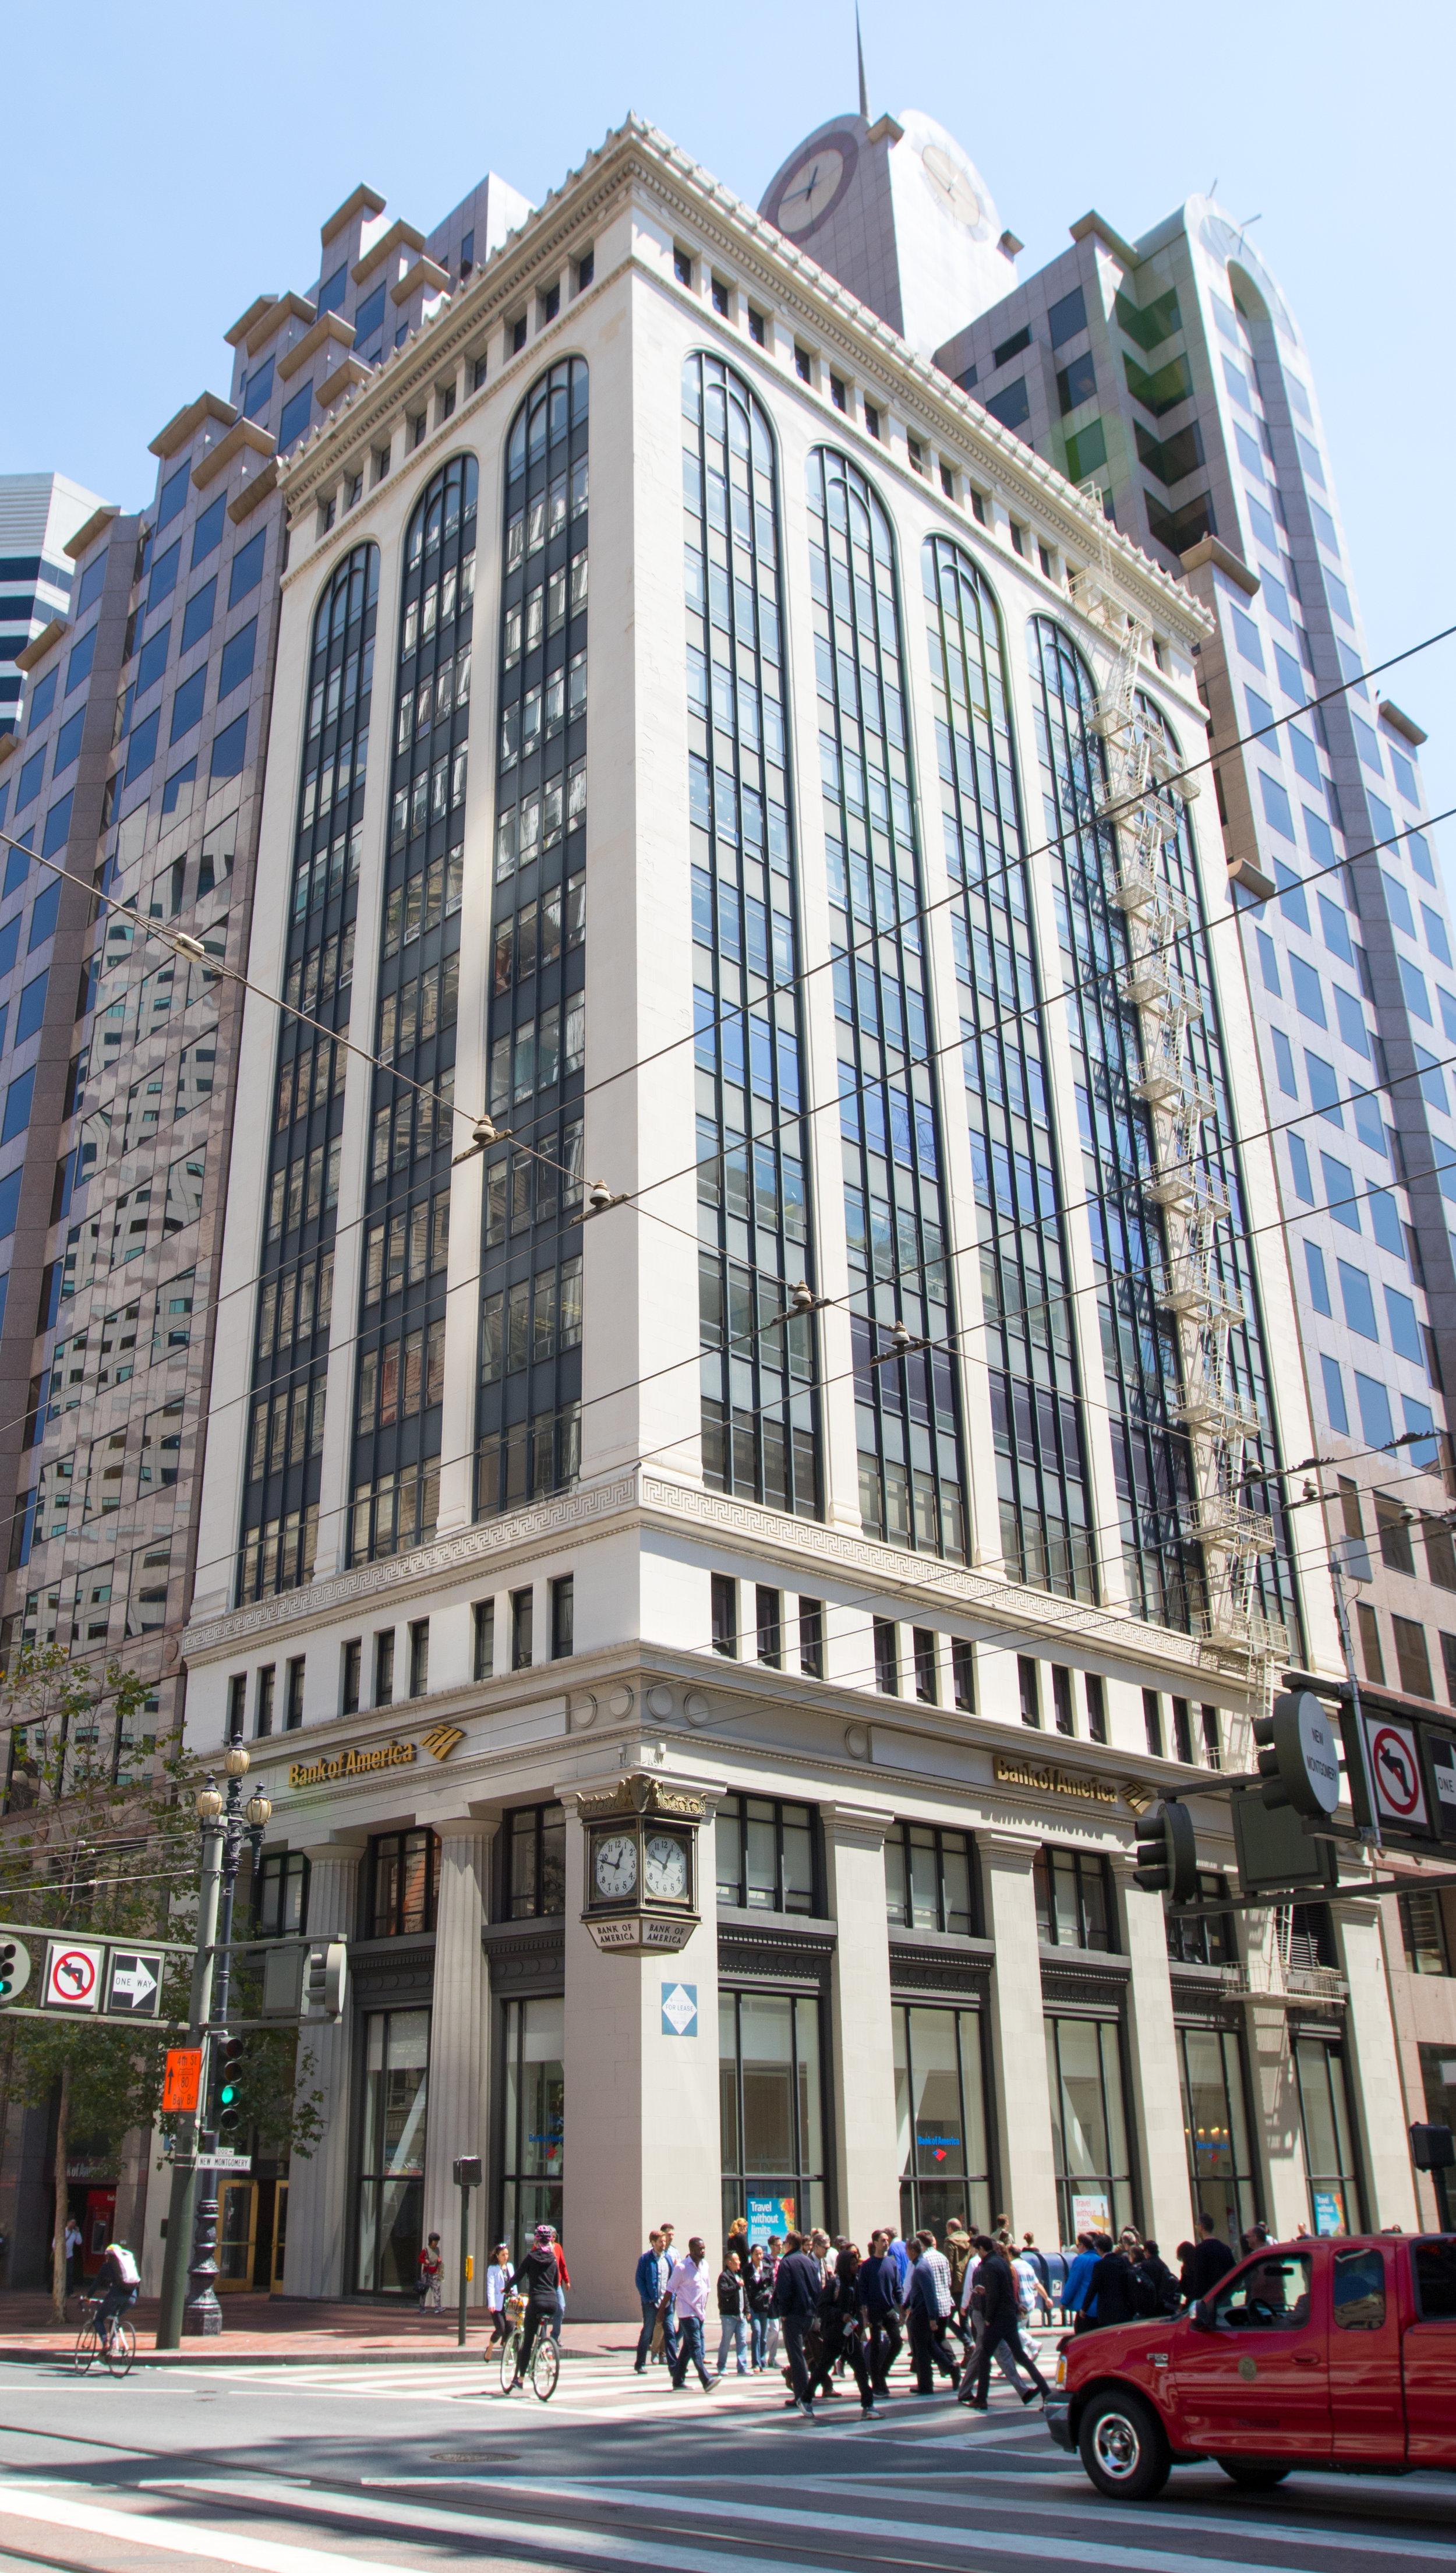 The Metropolis Trust Building